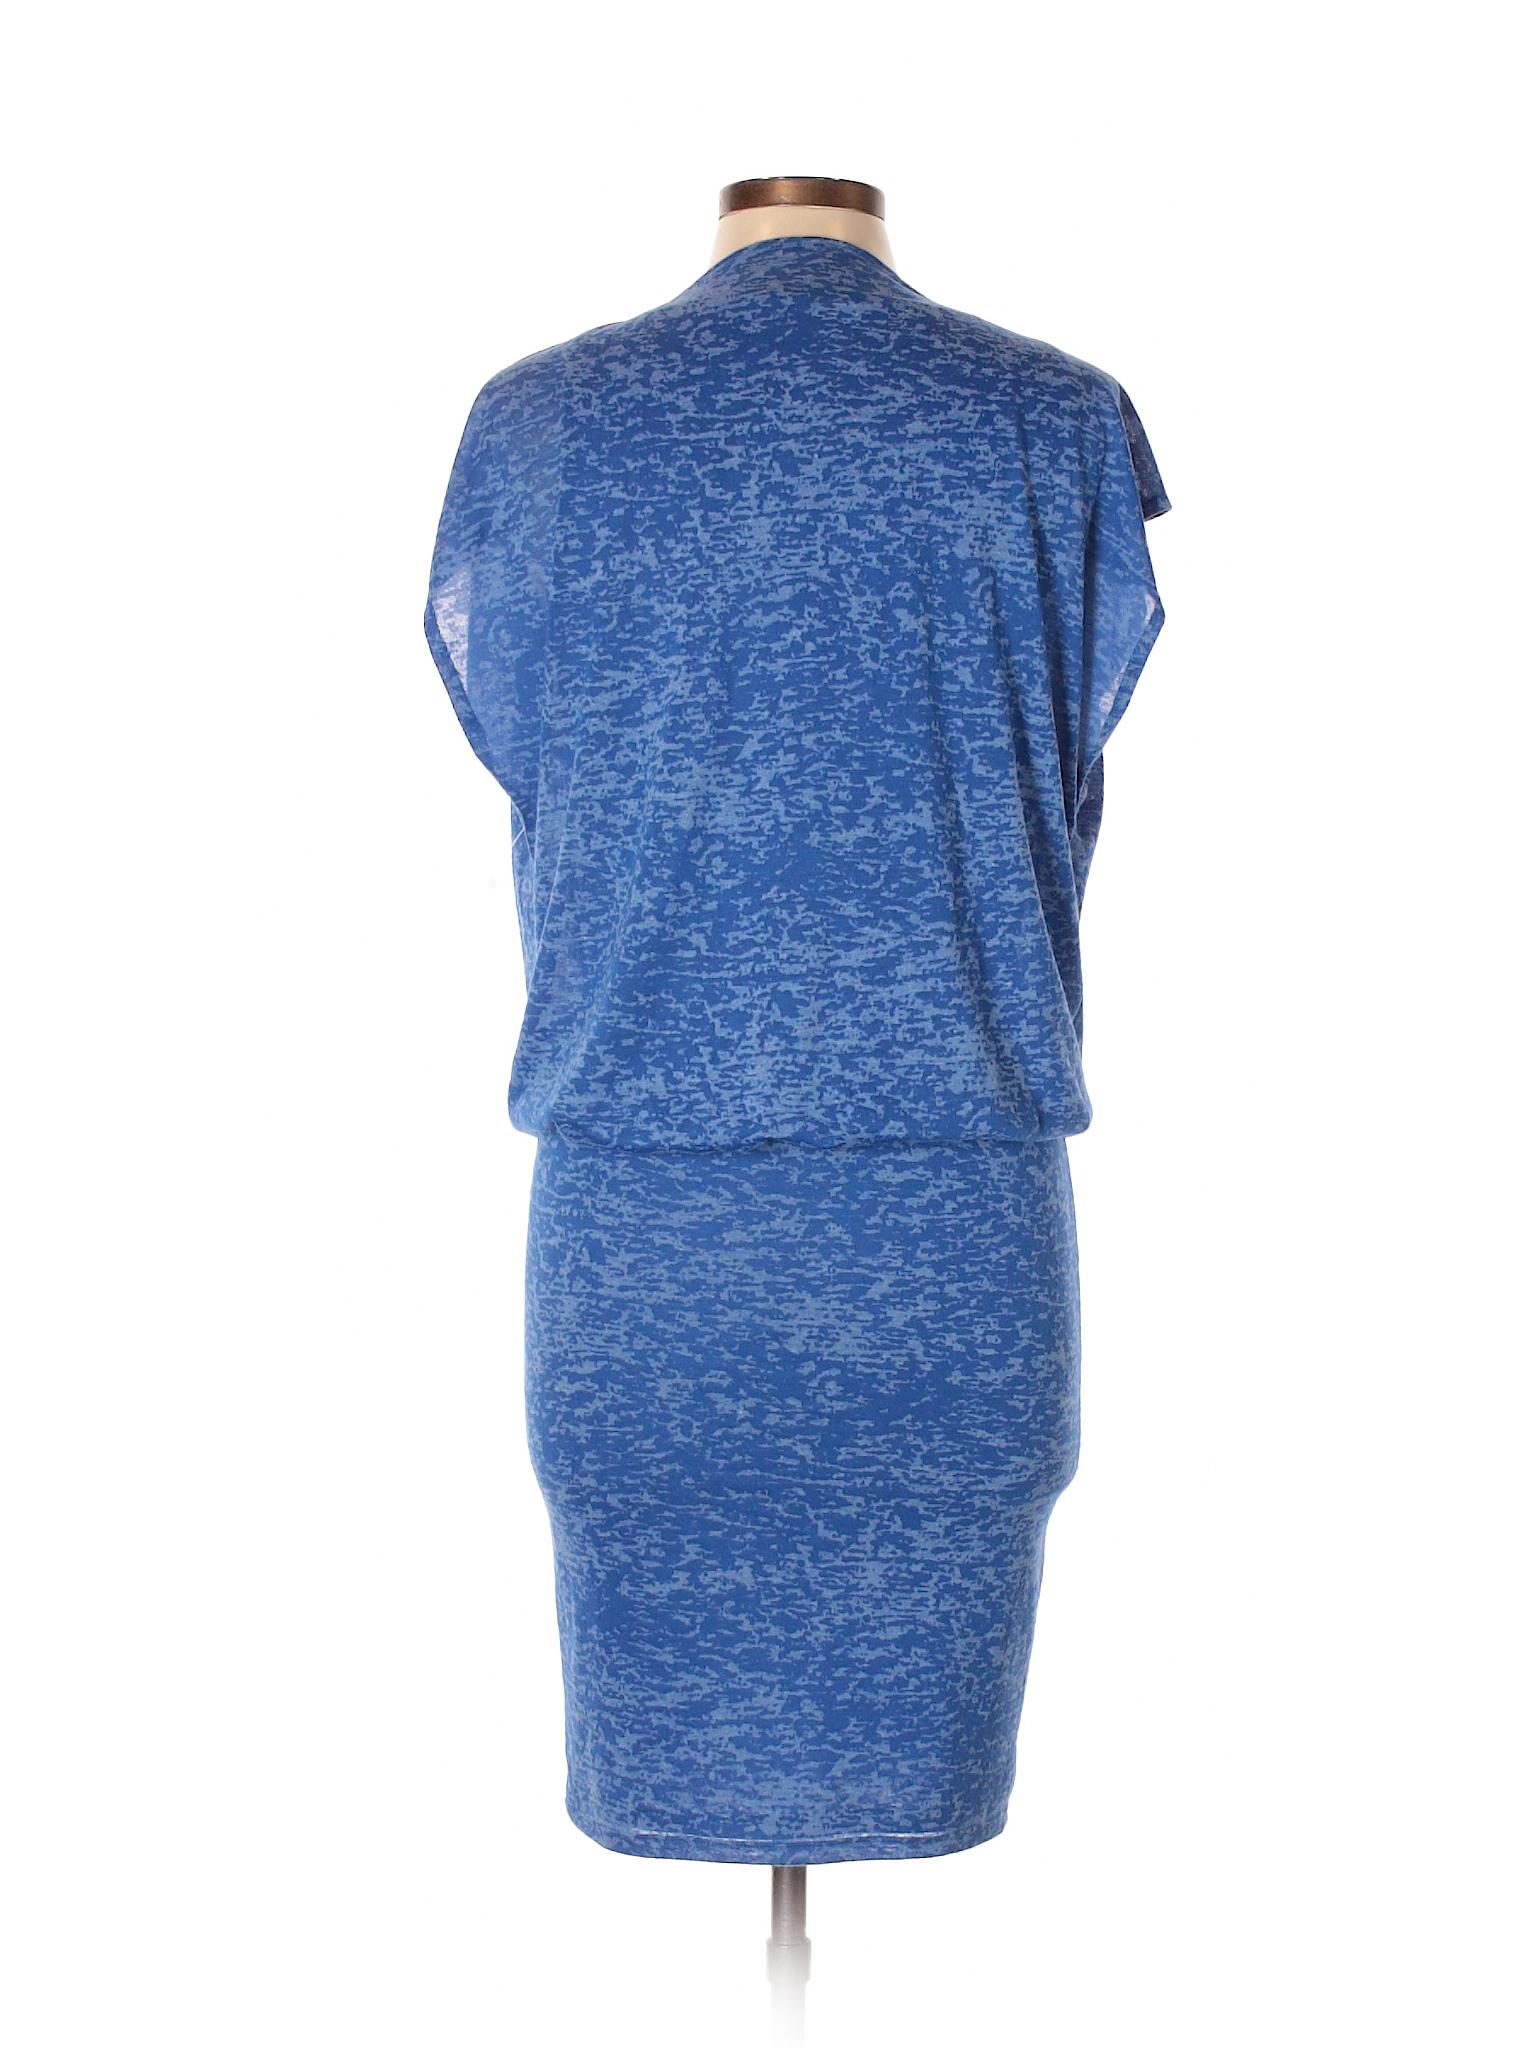 alice Casual olivia winter Dress Boutique fwqCx1OB8n